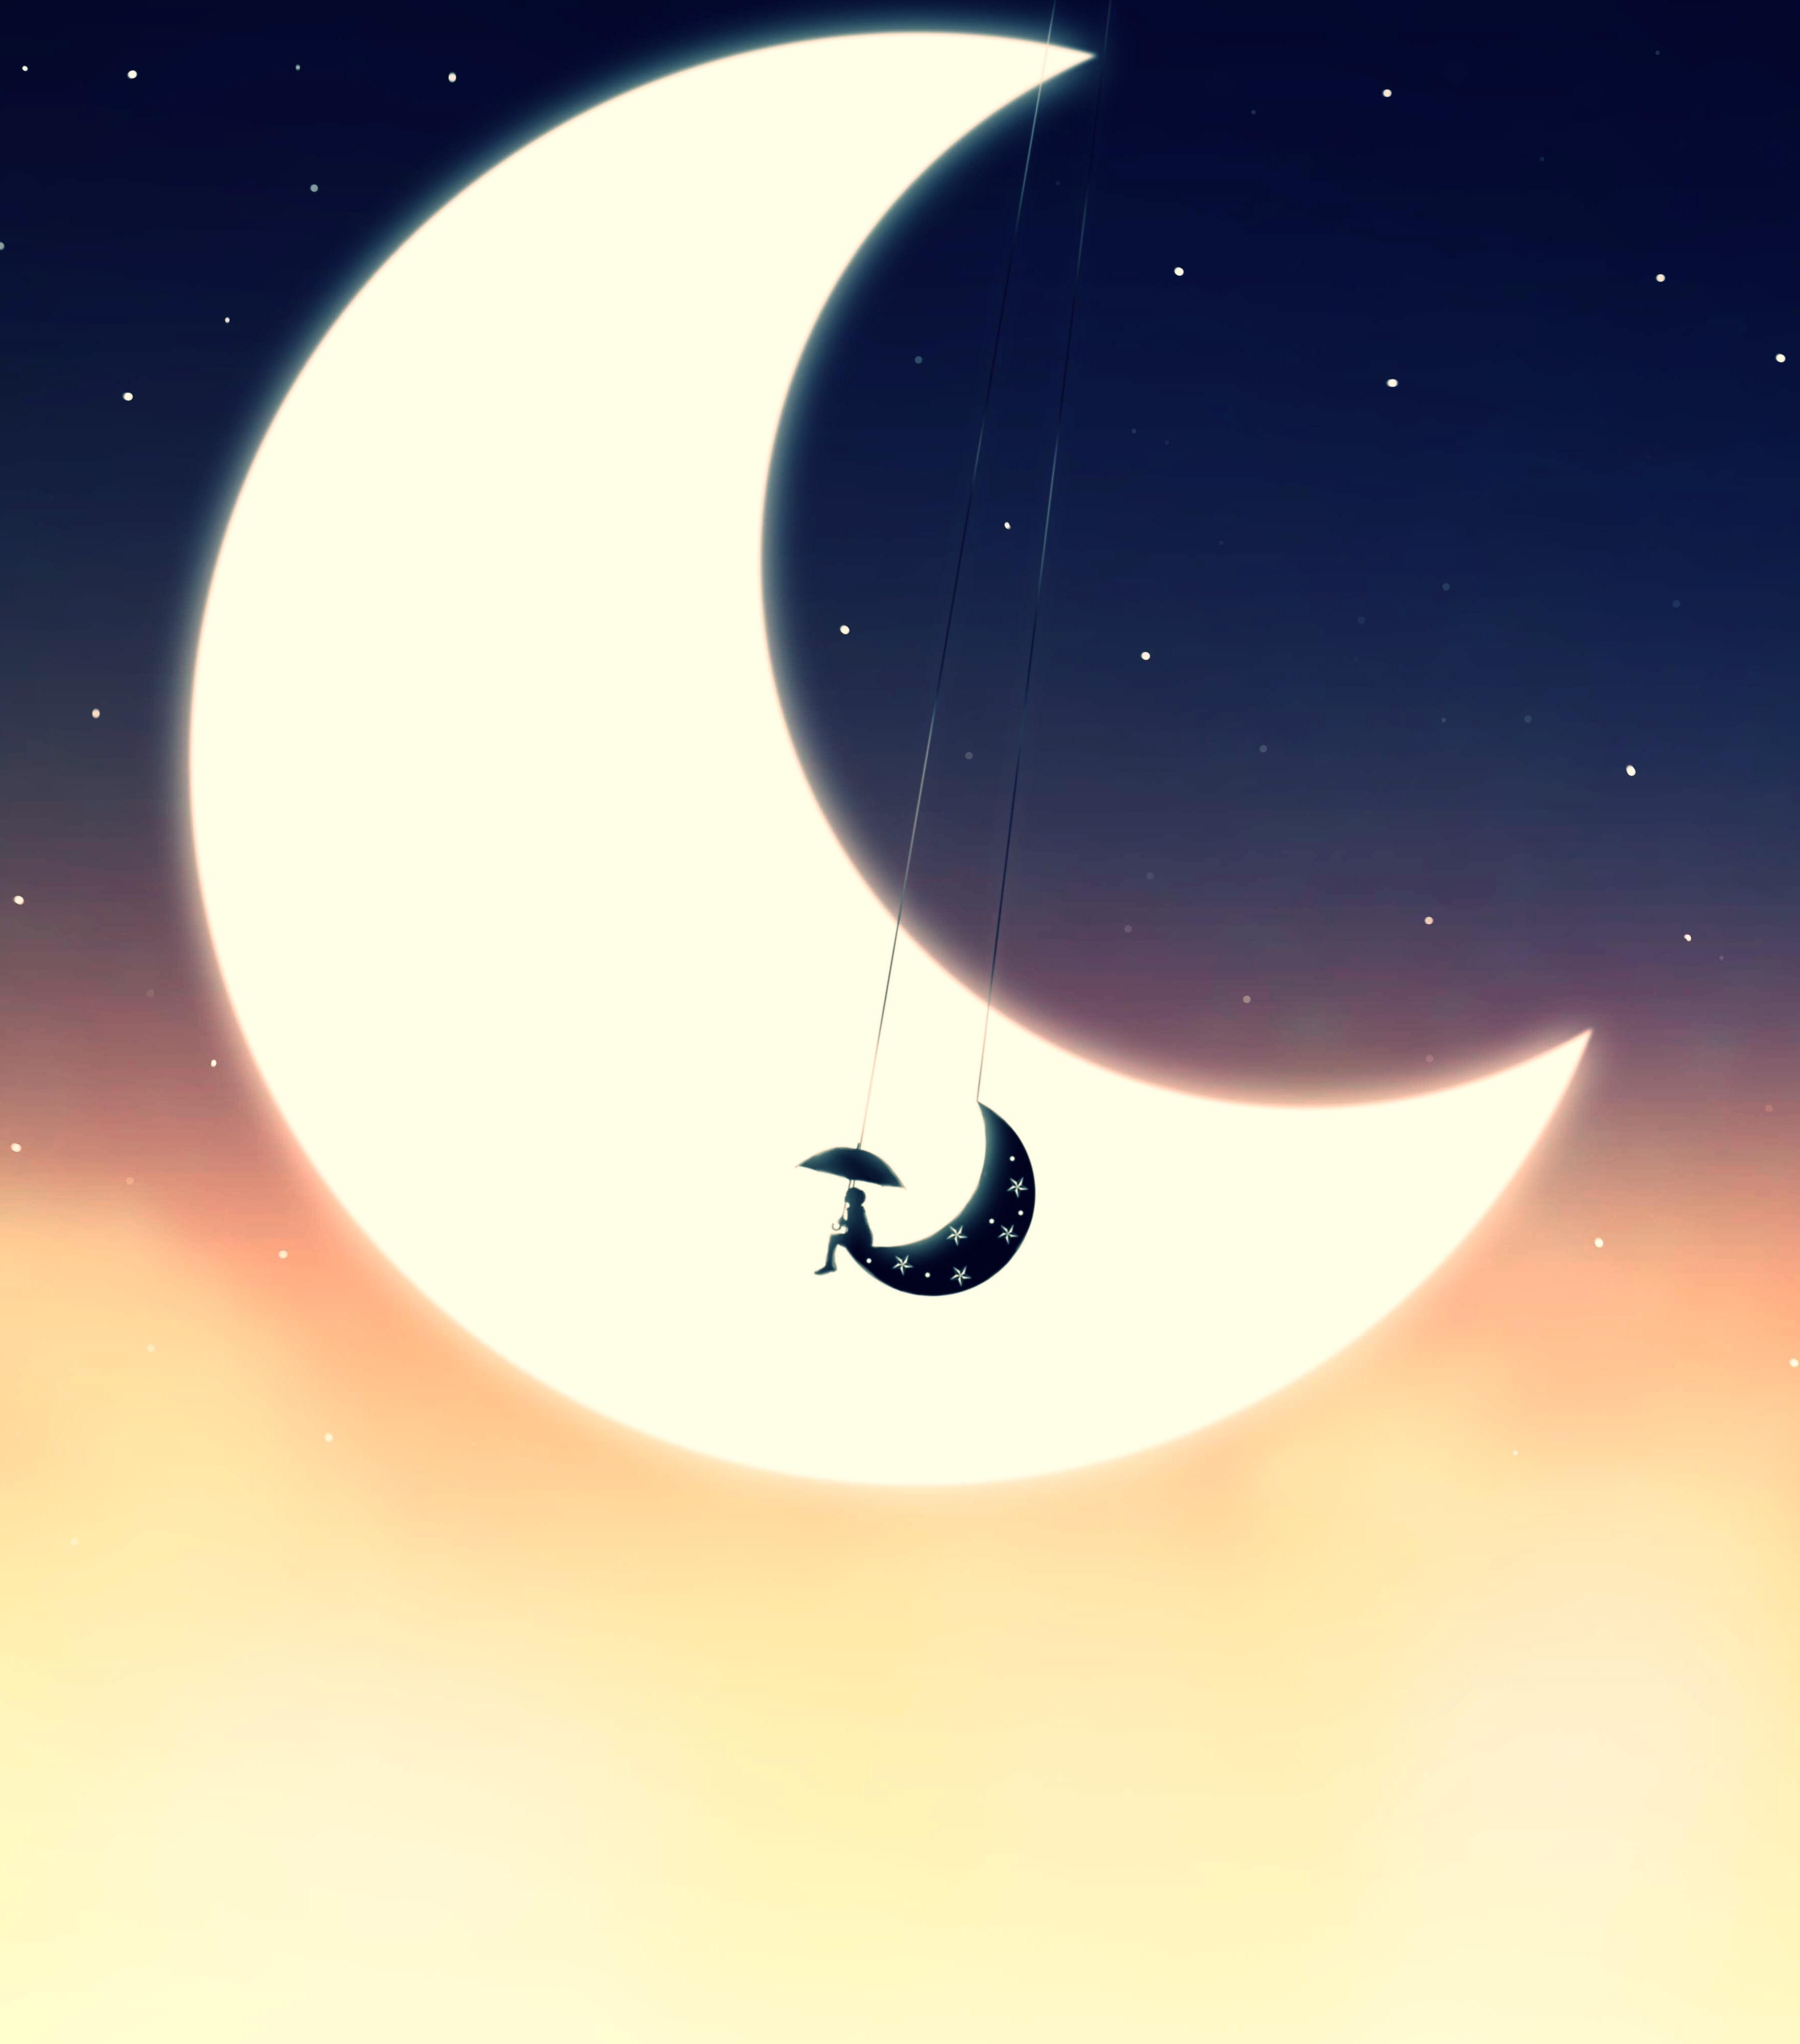 артистки луна картинка рисунок гармонично